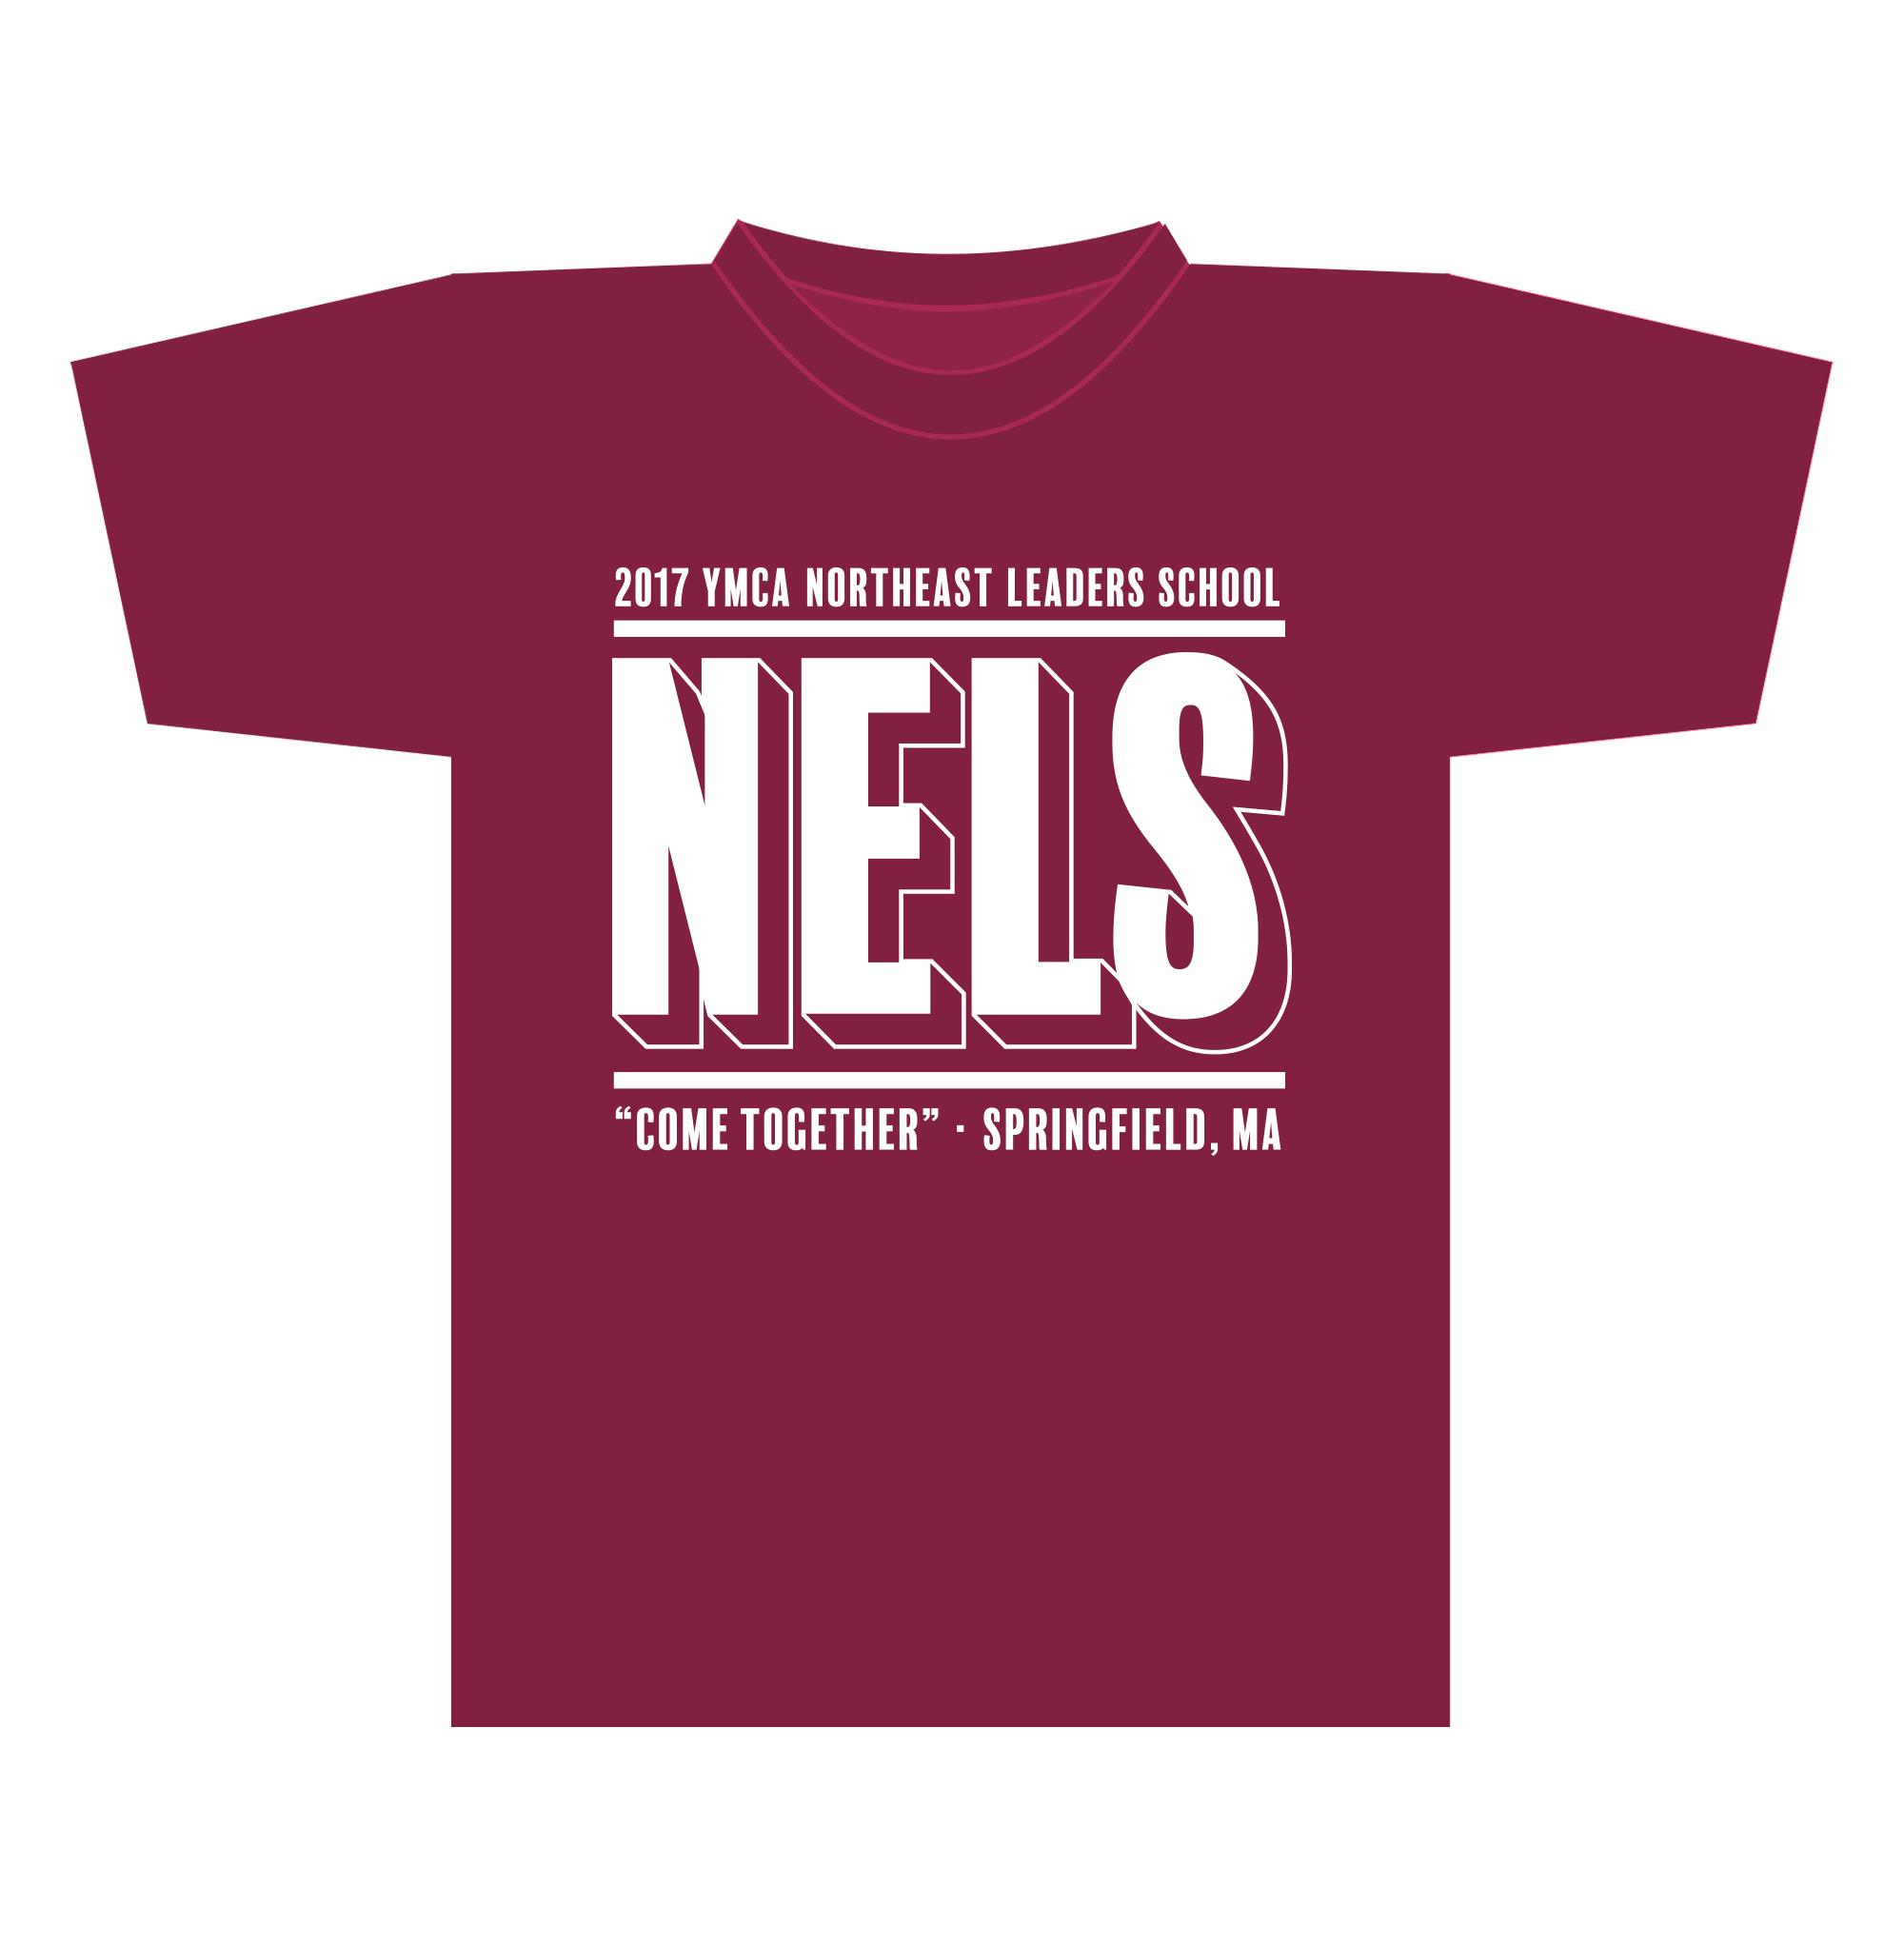 NELS on Shirts 2017.jpg